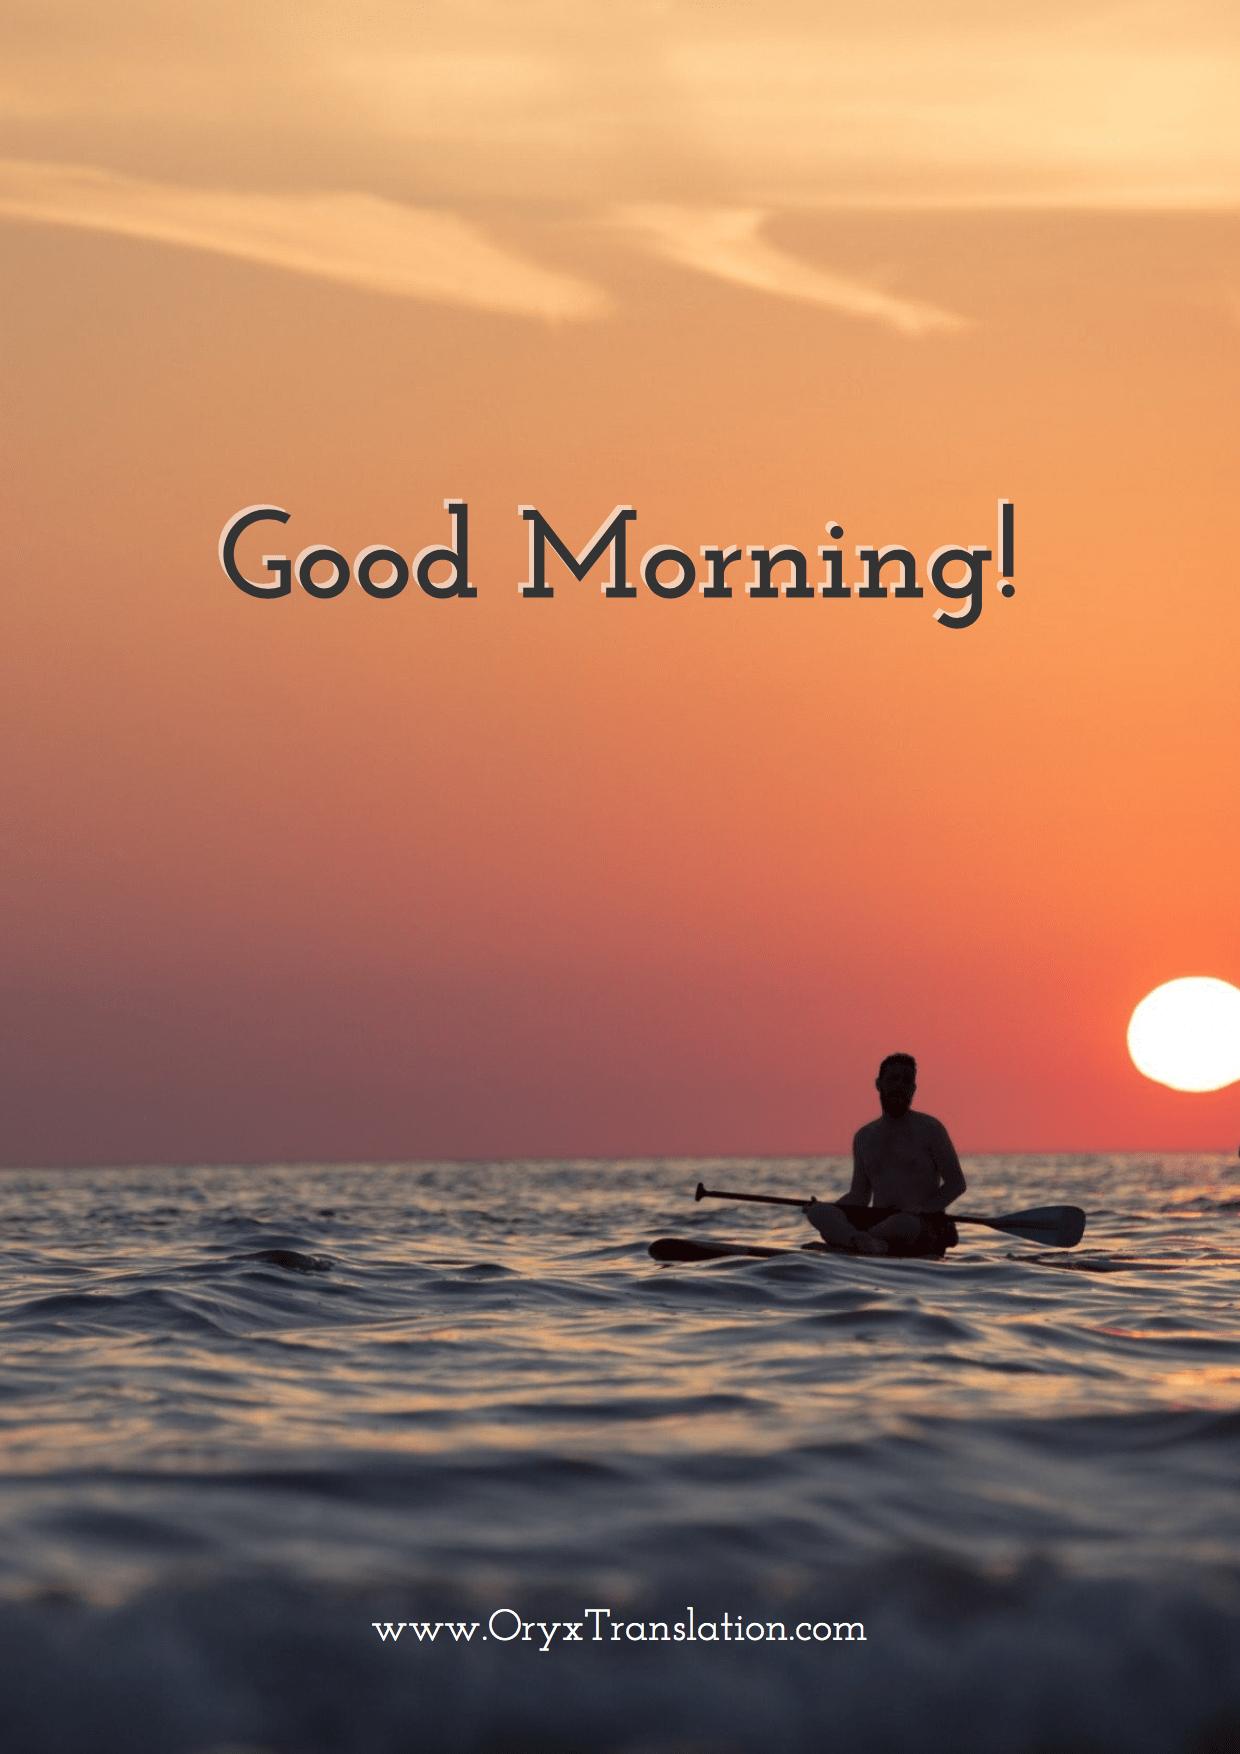 Good Morning صباح الخير Goodmorning Morning Sundaymorning Mornings Earlymorning Morningmotivation Oryx Good Morning Poster Movie Posters